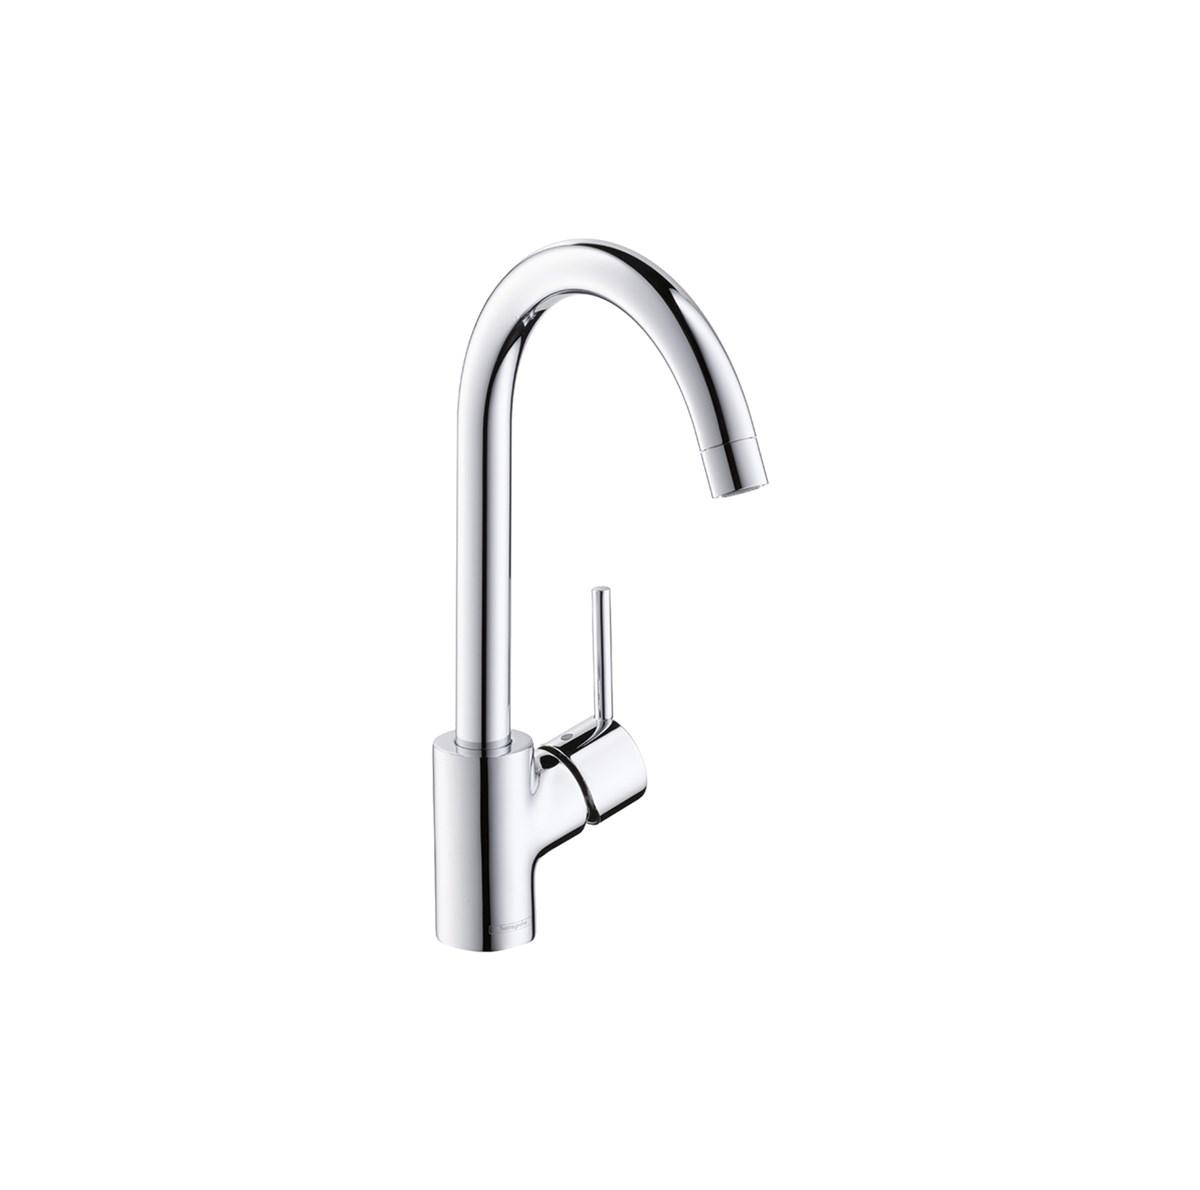 Hansgrohe-Talis-M52-Kitchen-Mixer-270-14870000-Matisse-1